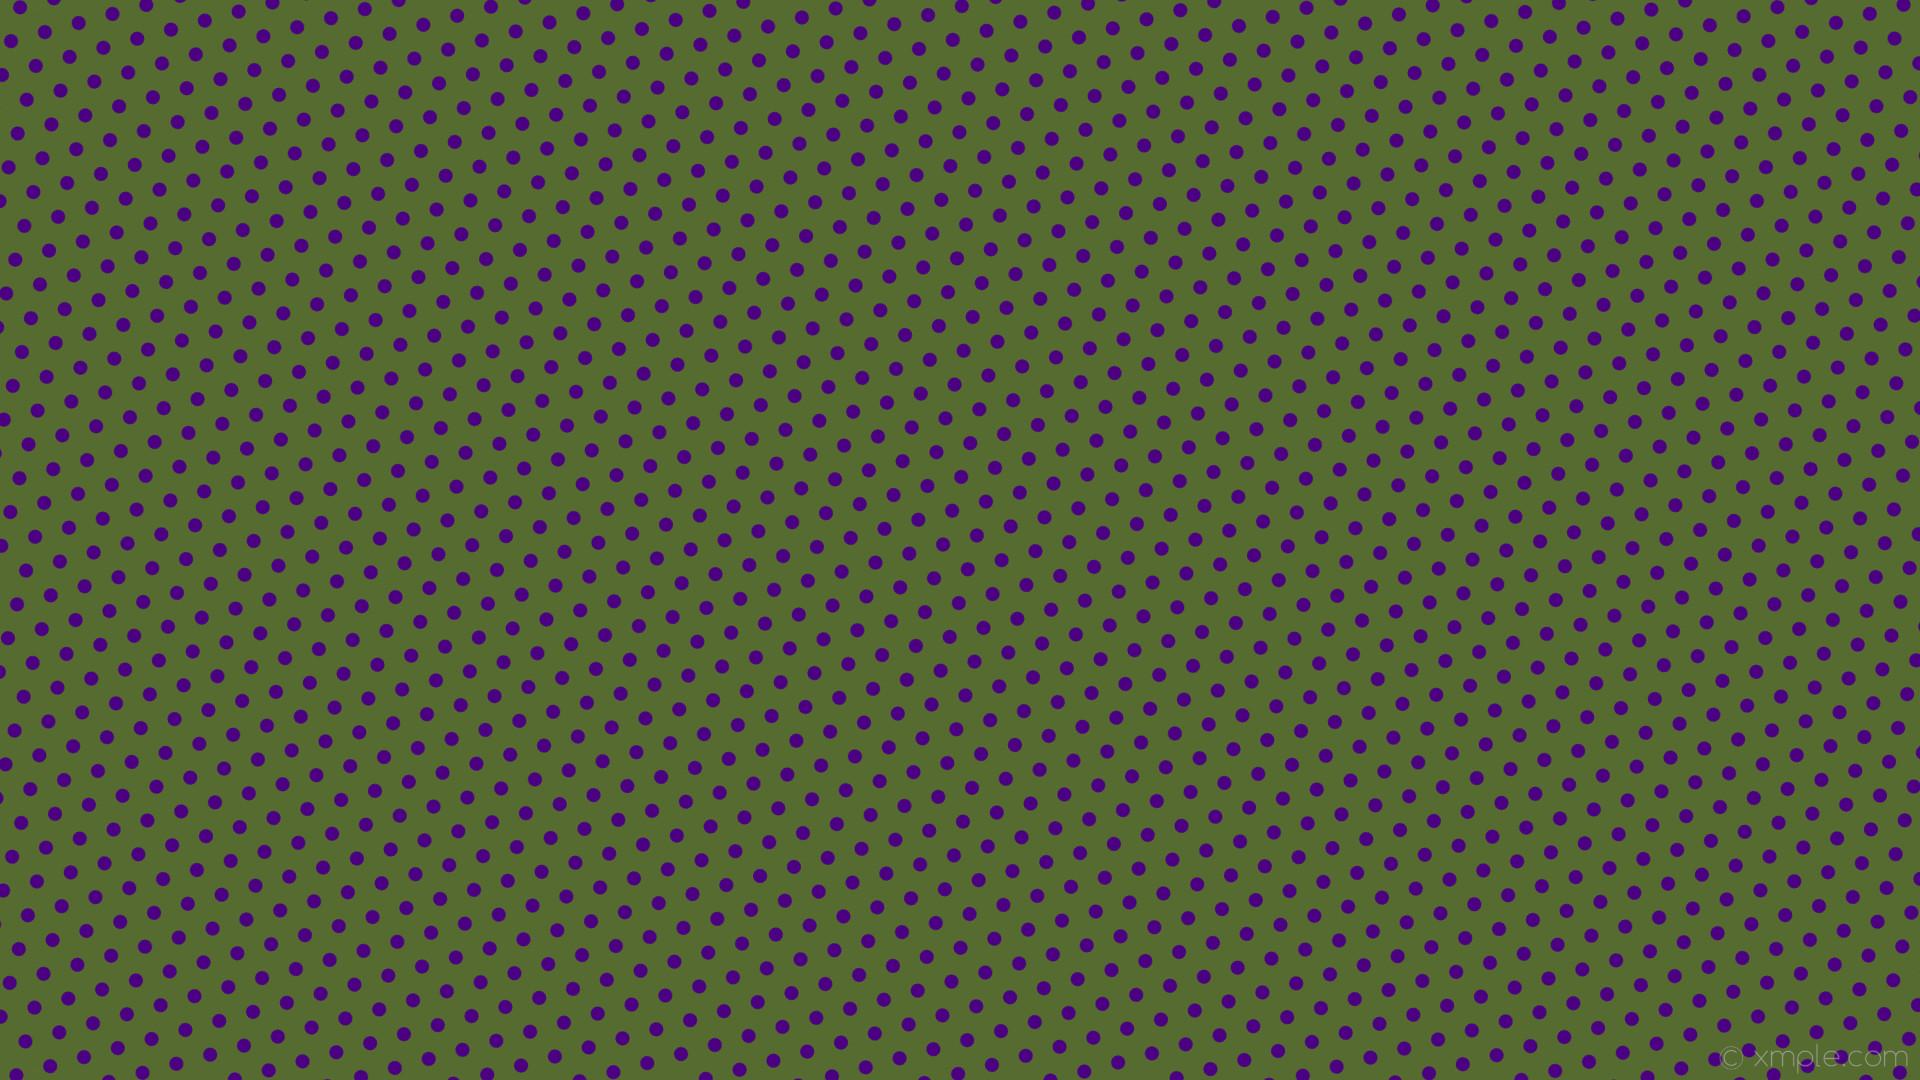 Res: 1920x1080, wallpaper green polka hexagon purple dots dark olive green indigo #556b2f  #4b0082 diagonal 15